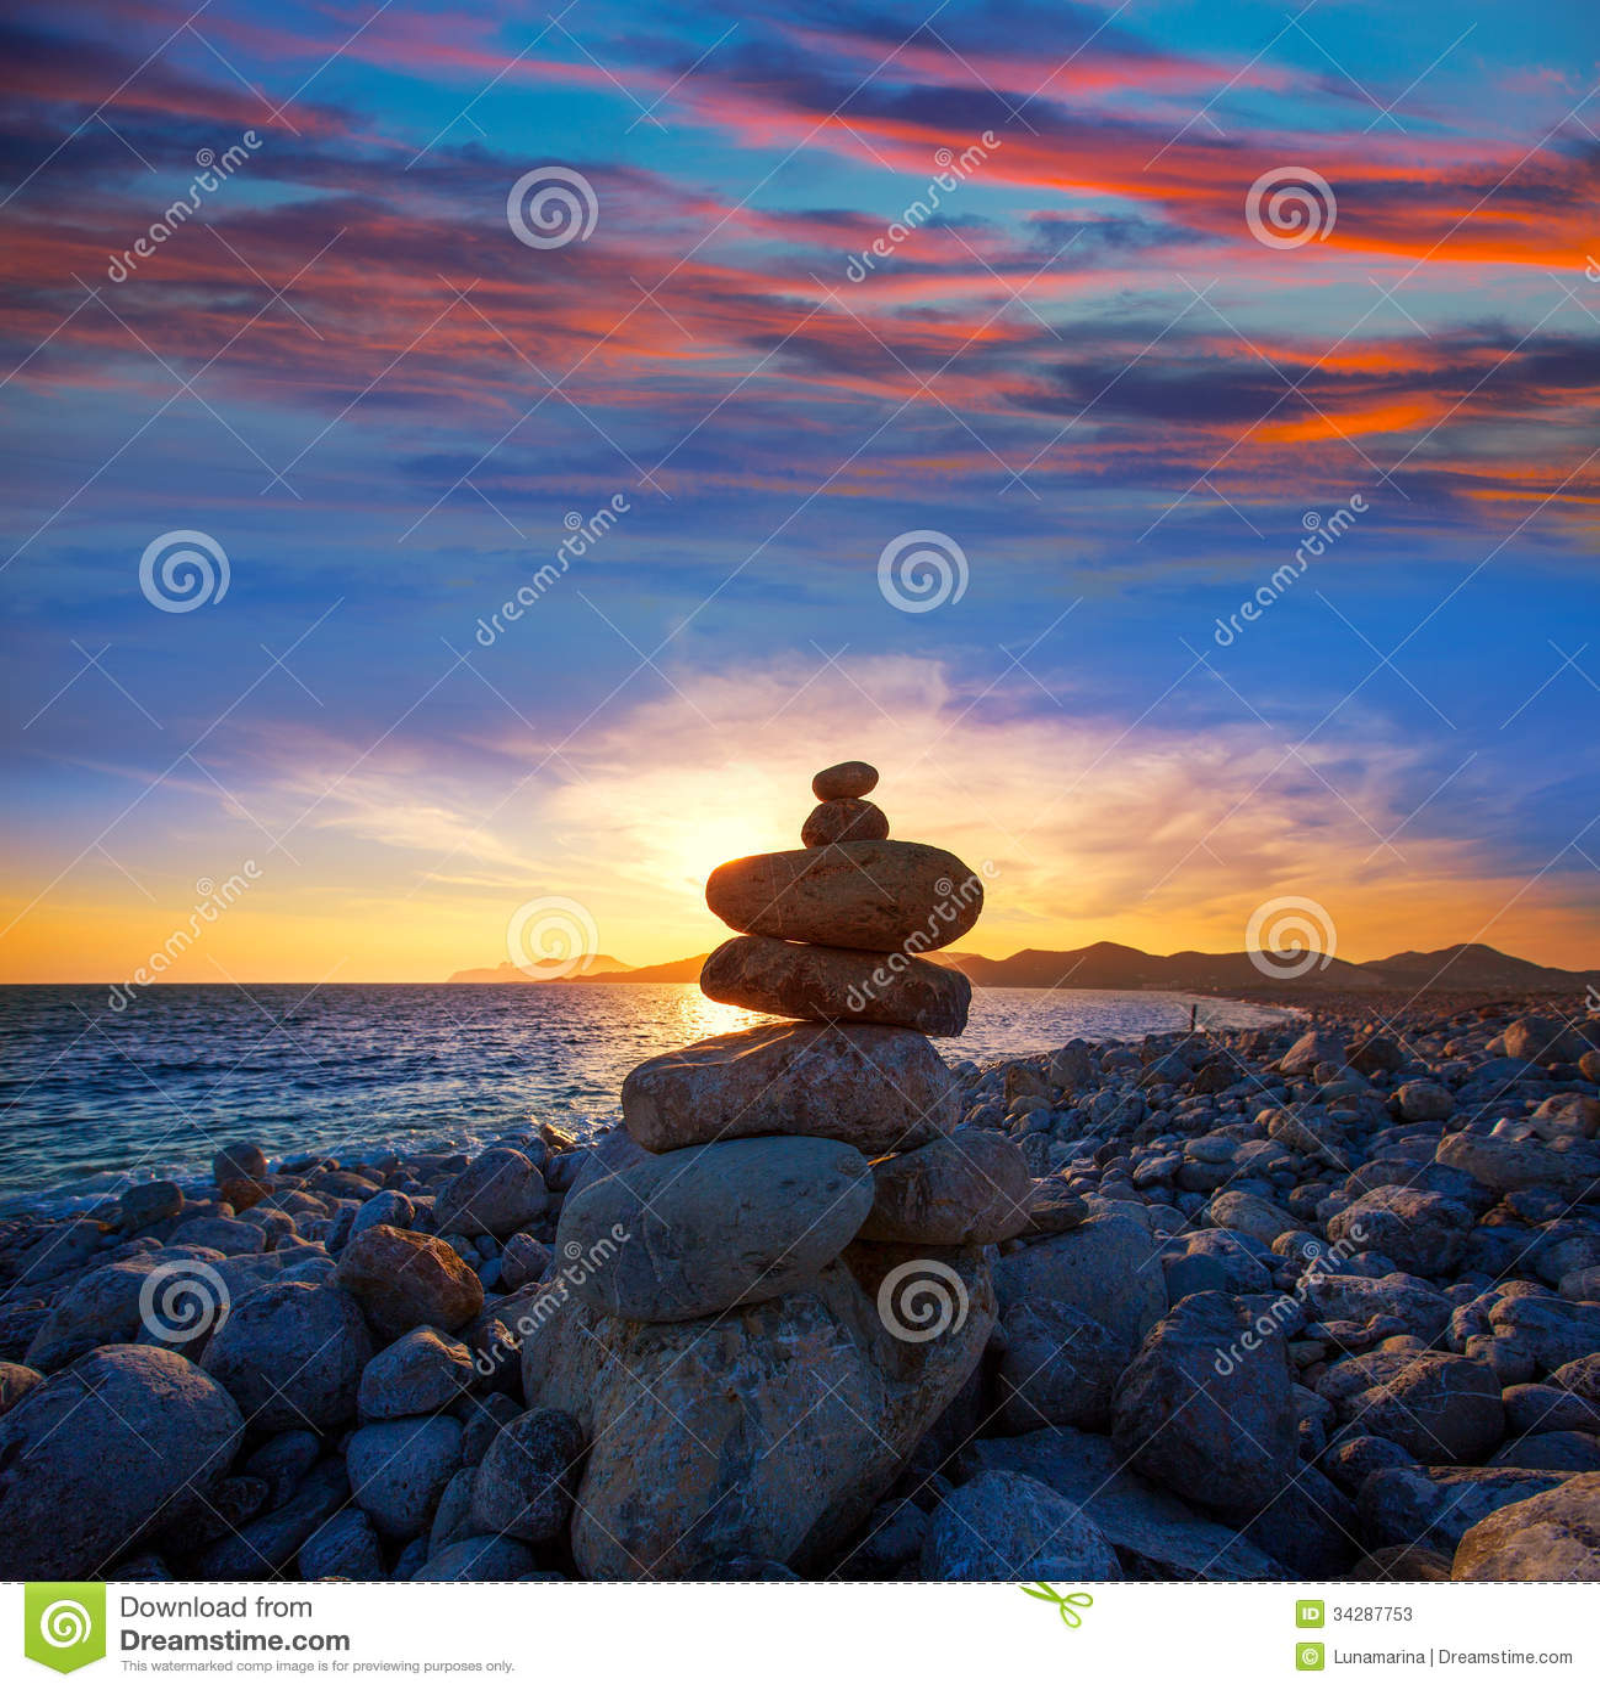 Ibiza Cap des Falco beach sunset with desire stones